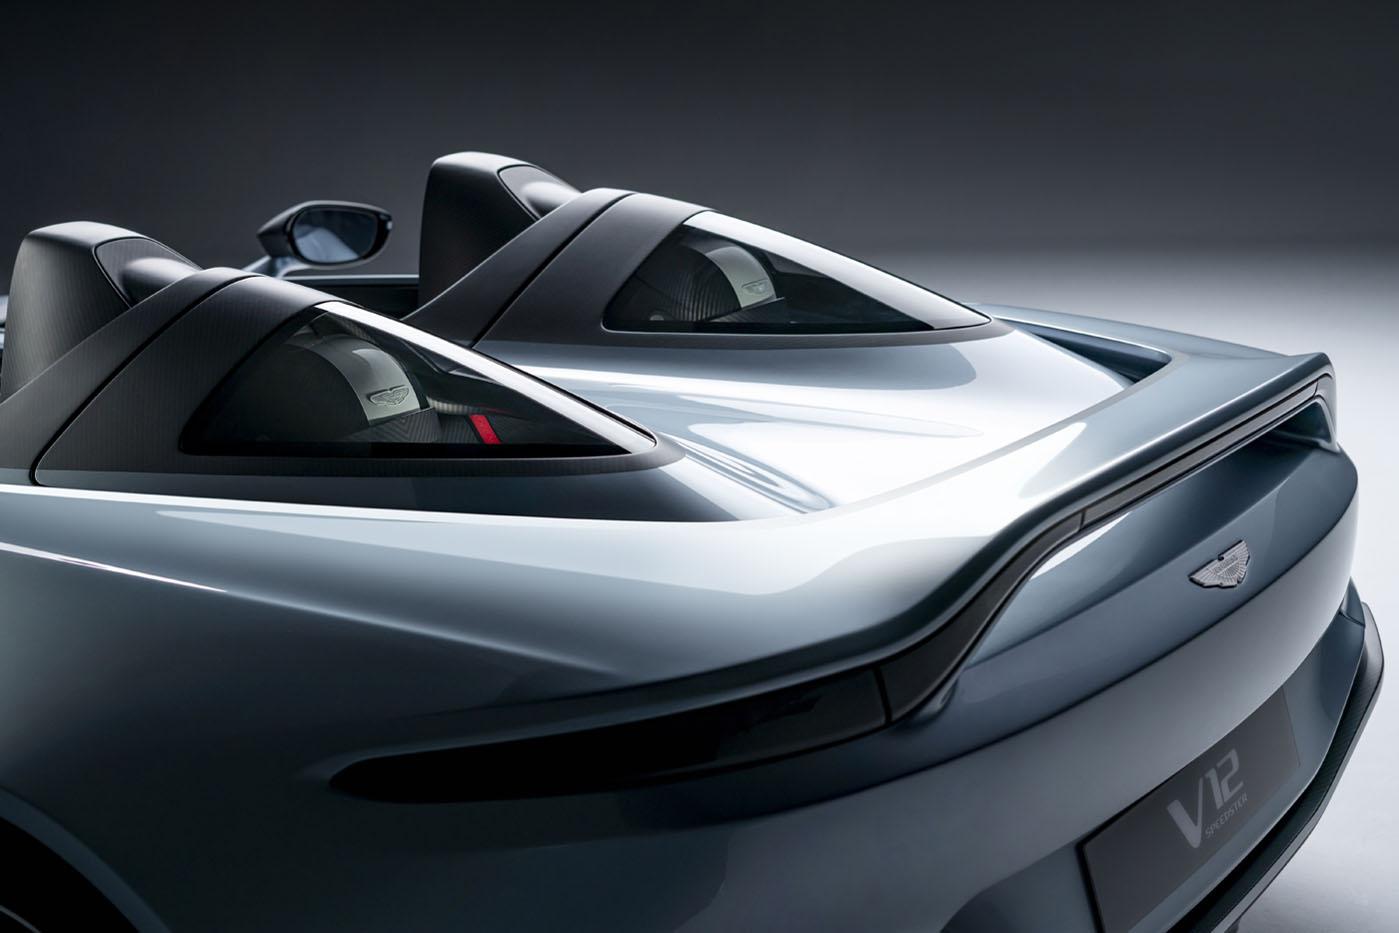 Aston Martin V12 Speedster - premiera